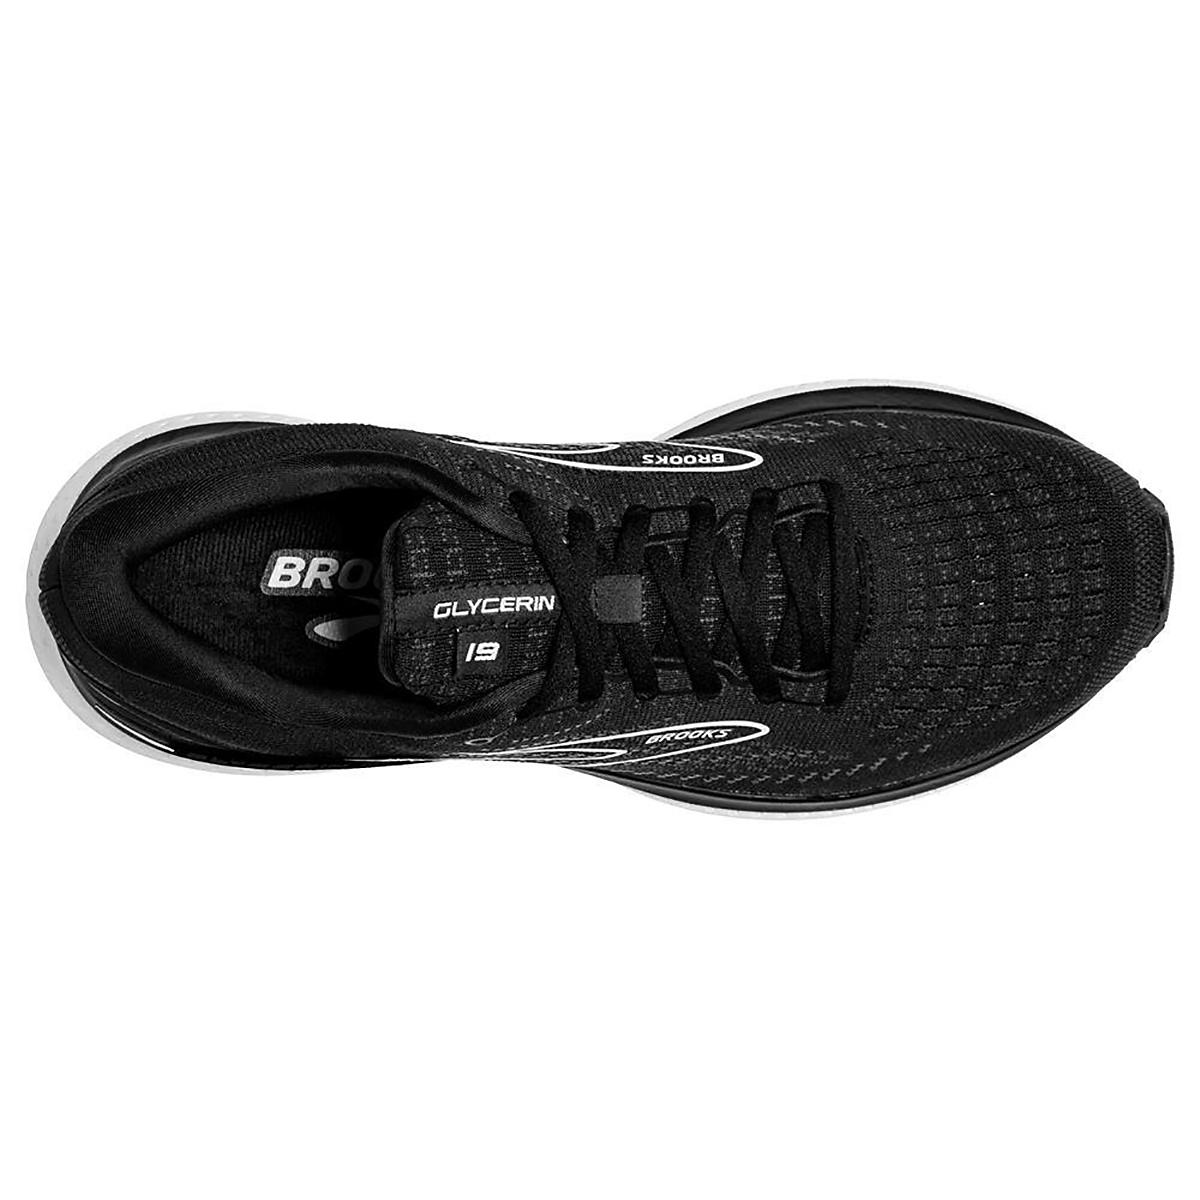 Men's Brooks Glycerin 19 Running Shoe - Color: Black/White - Size: 7 - Width: Regular, Black/White, large, image 5